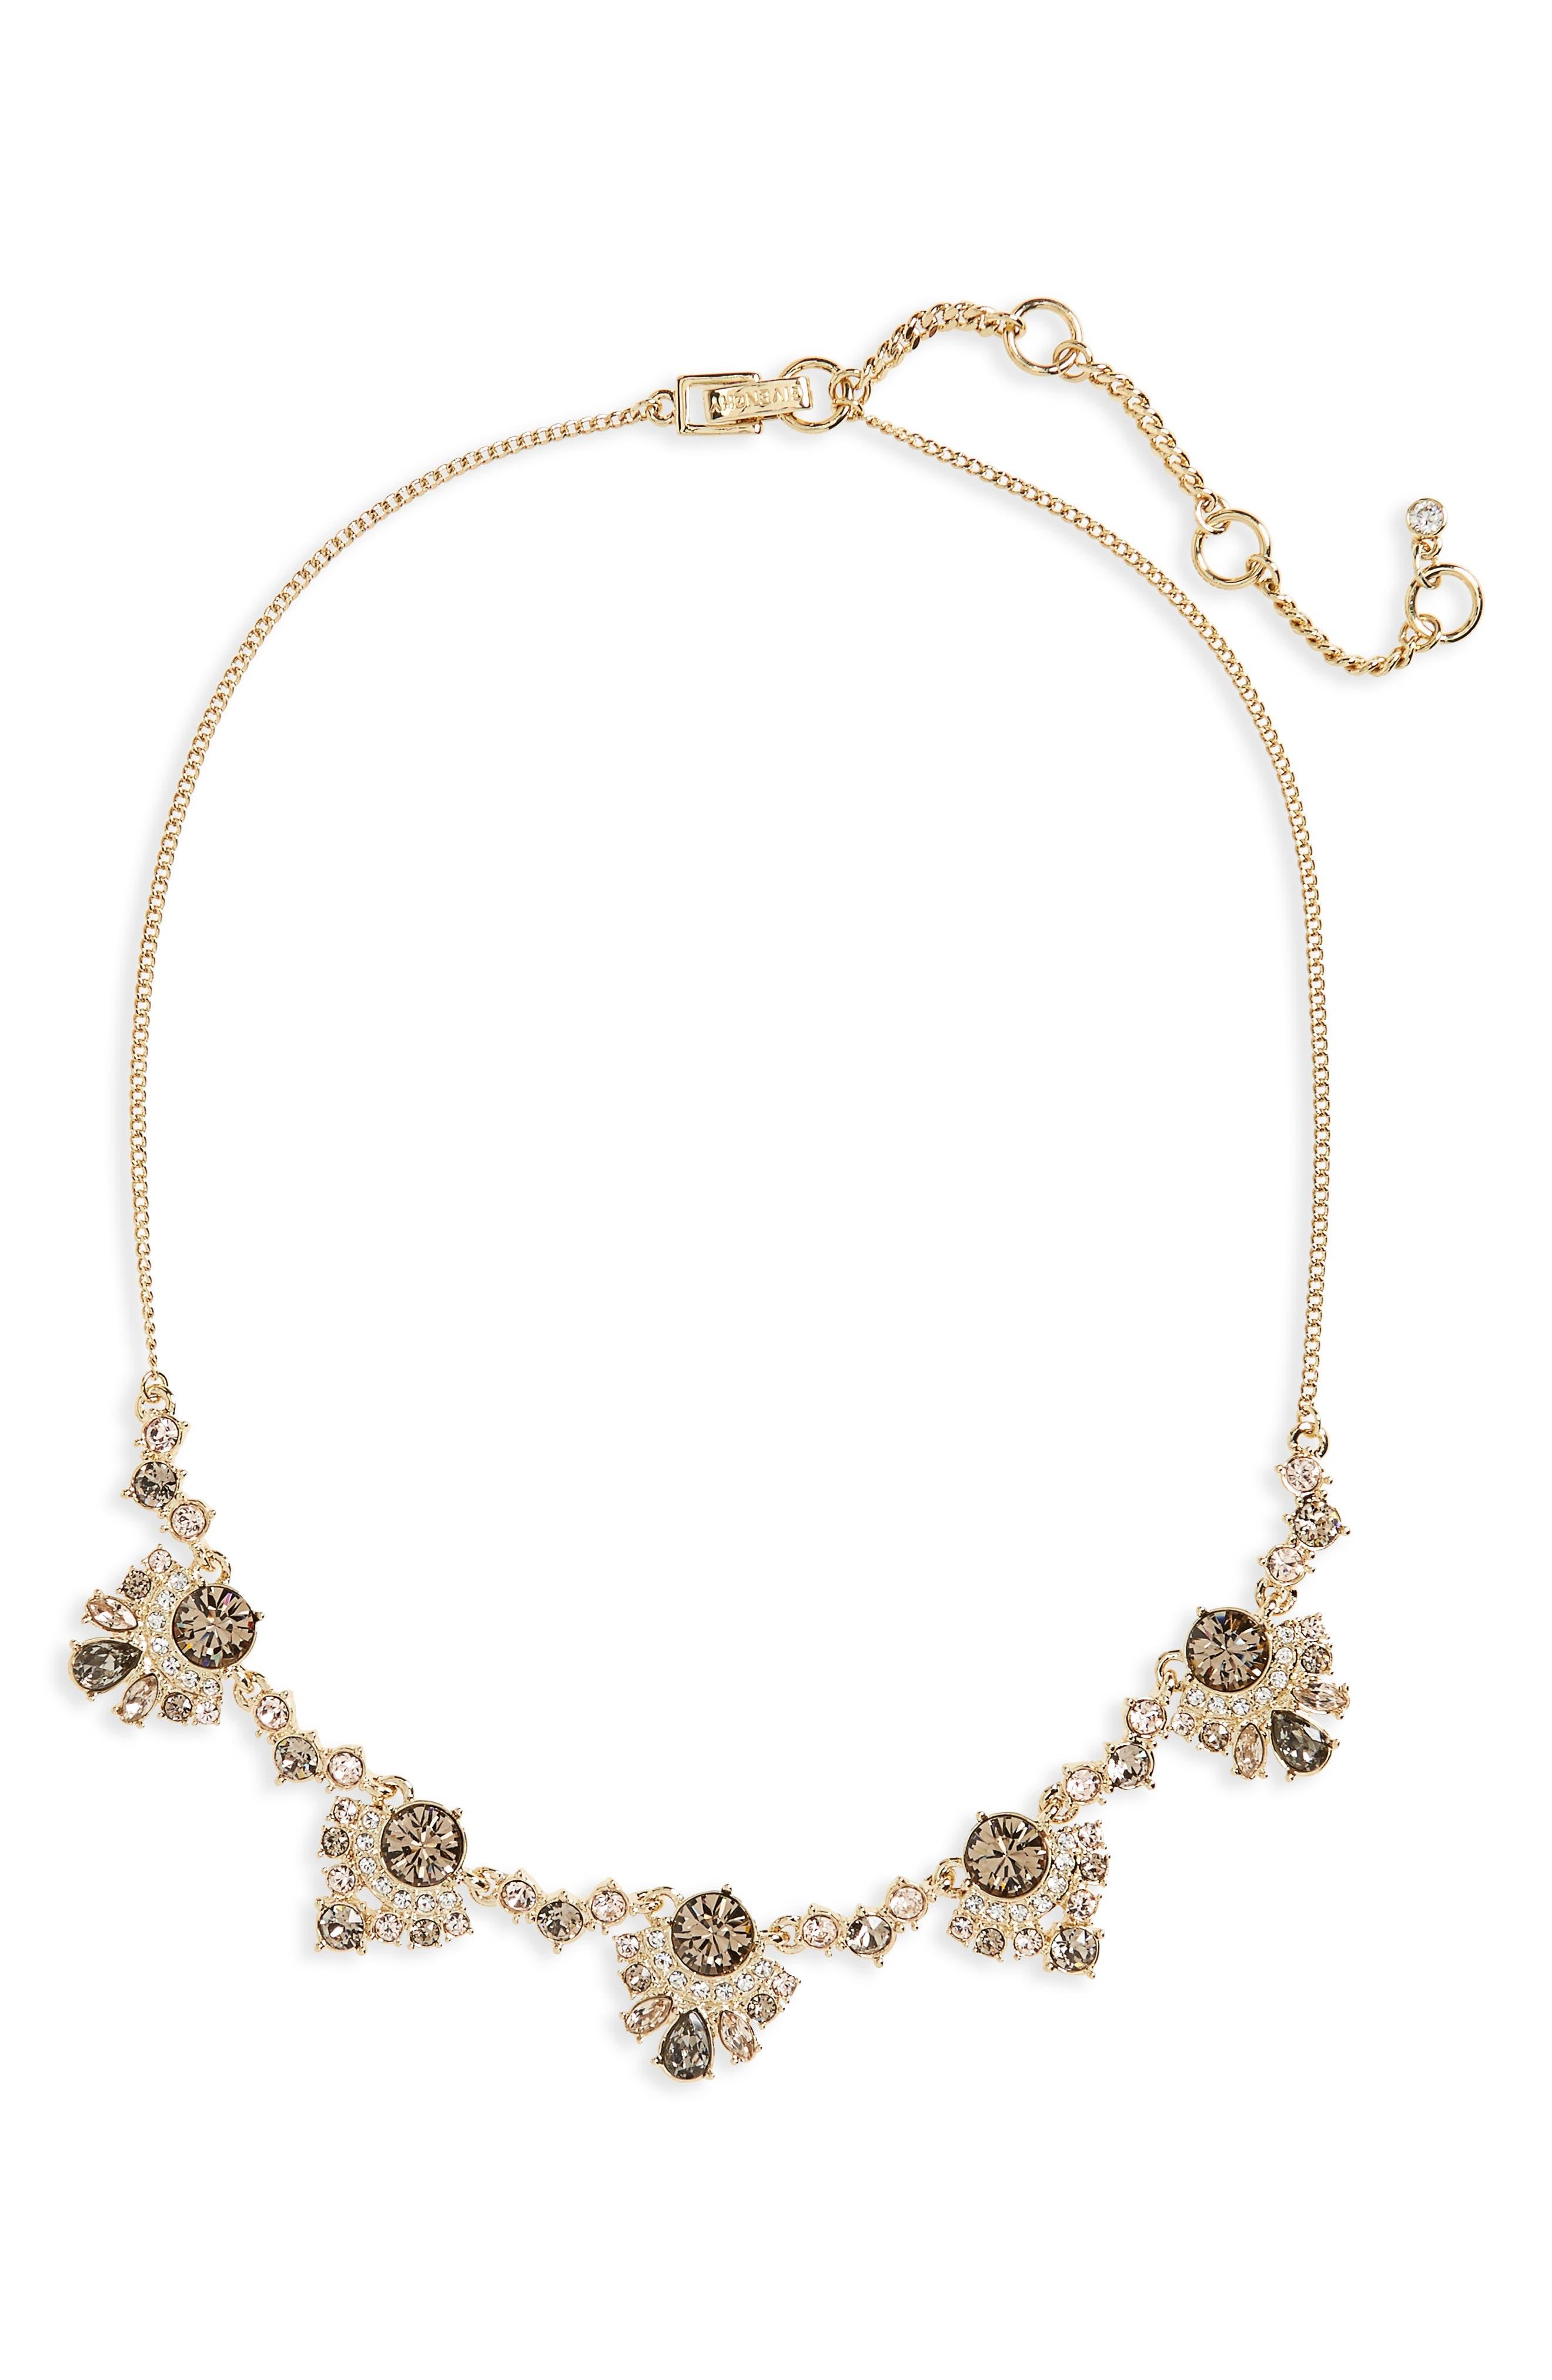 Main Image - Givenchy Verona Frontal Necklace